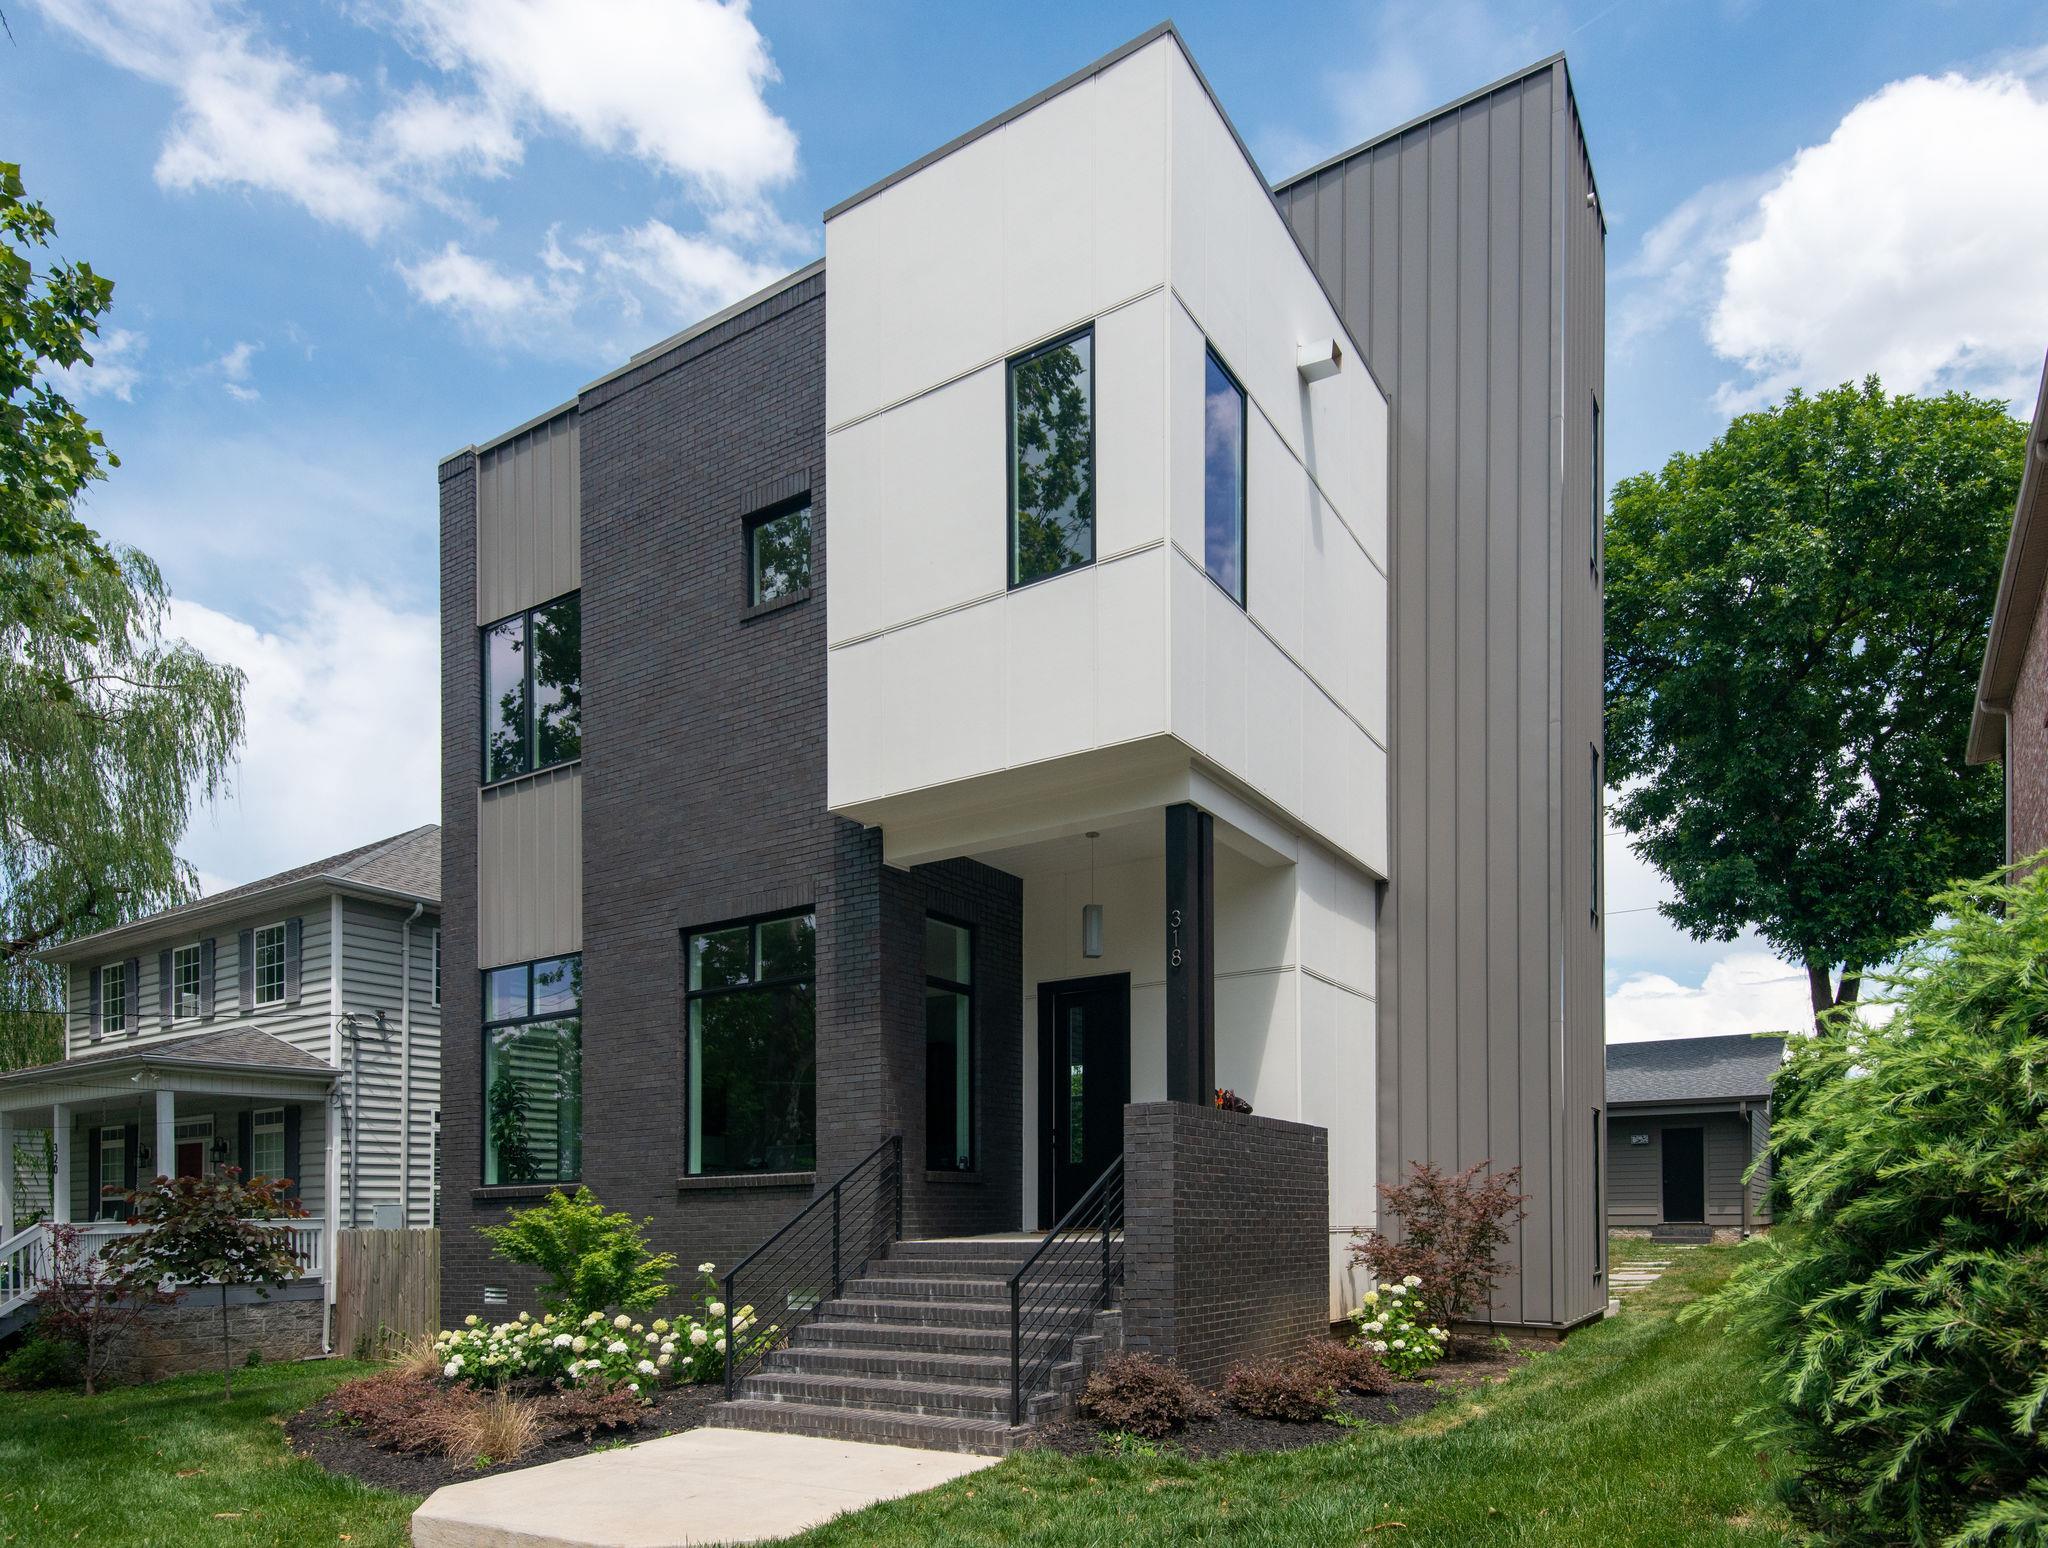 318 33rd Ave N, Nashville, TN 37209 - Nashville, TN real estate listing